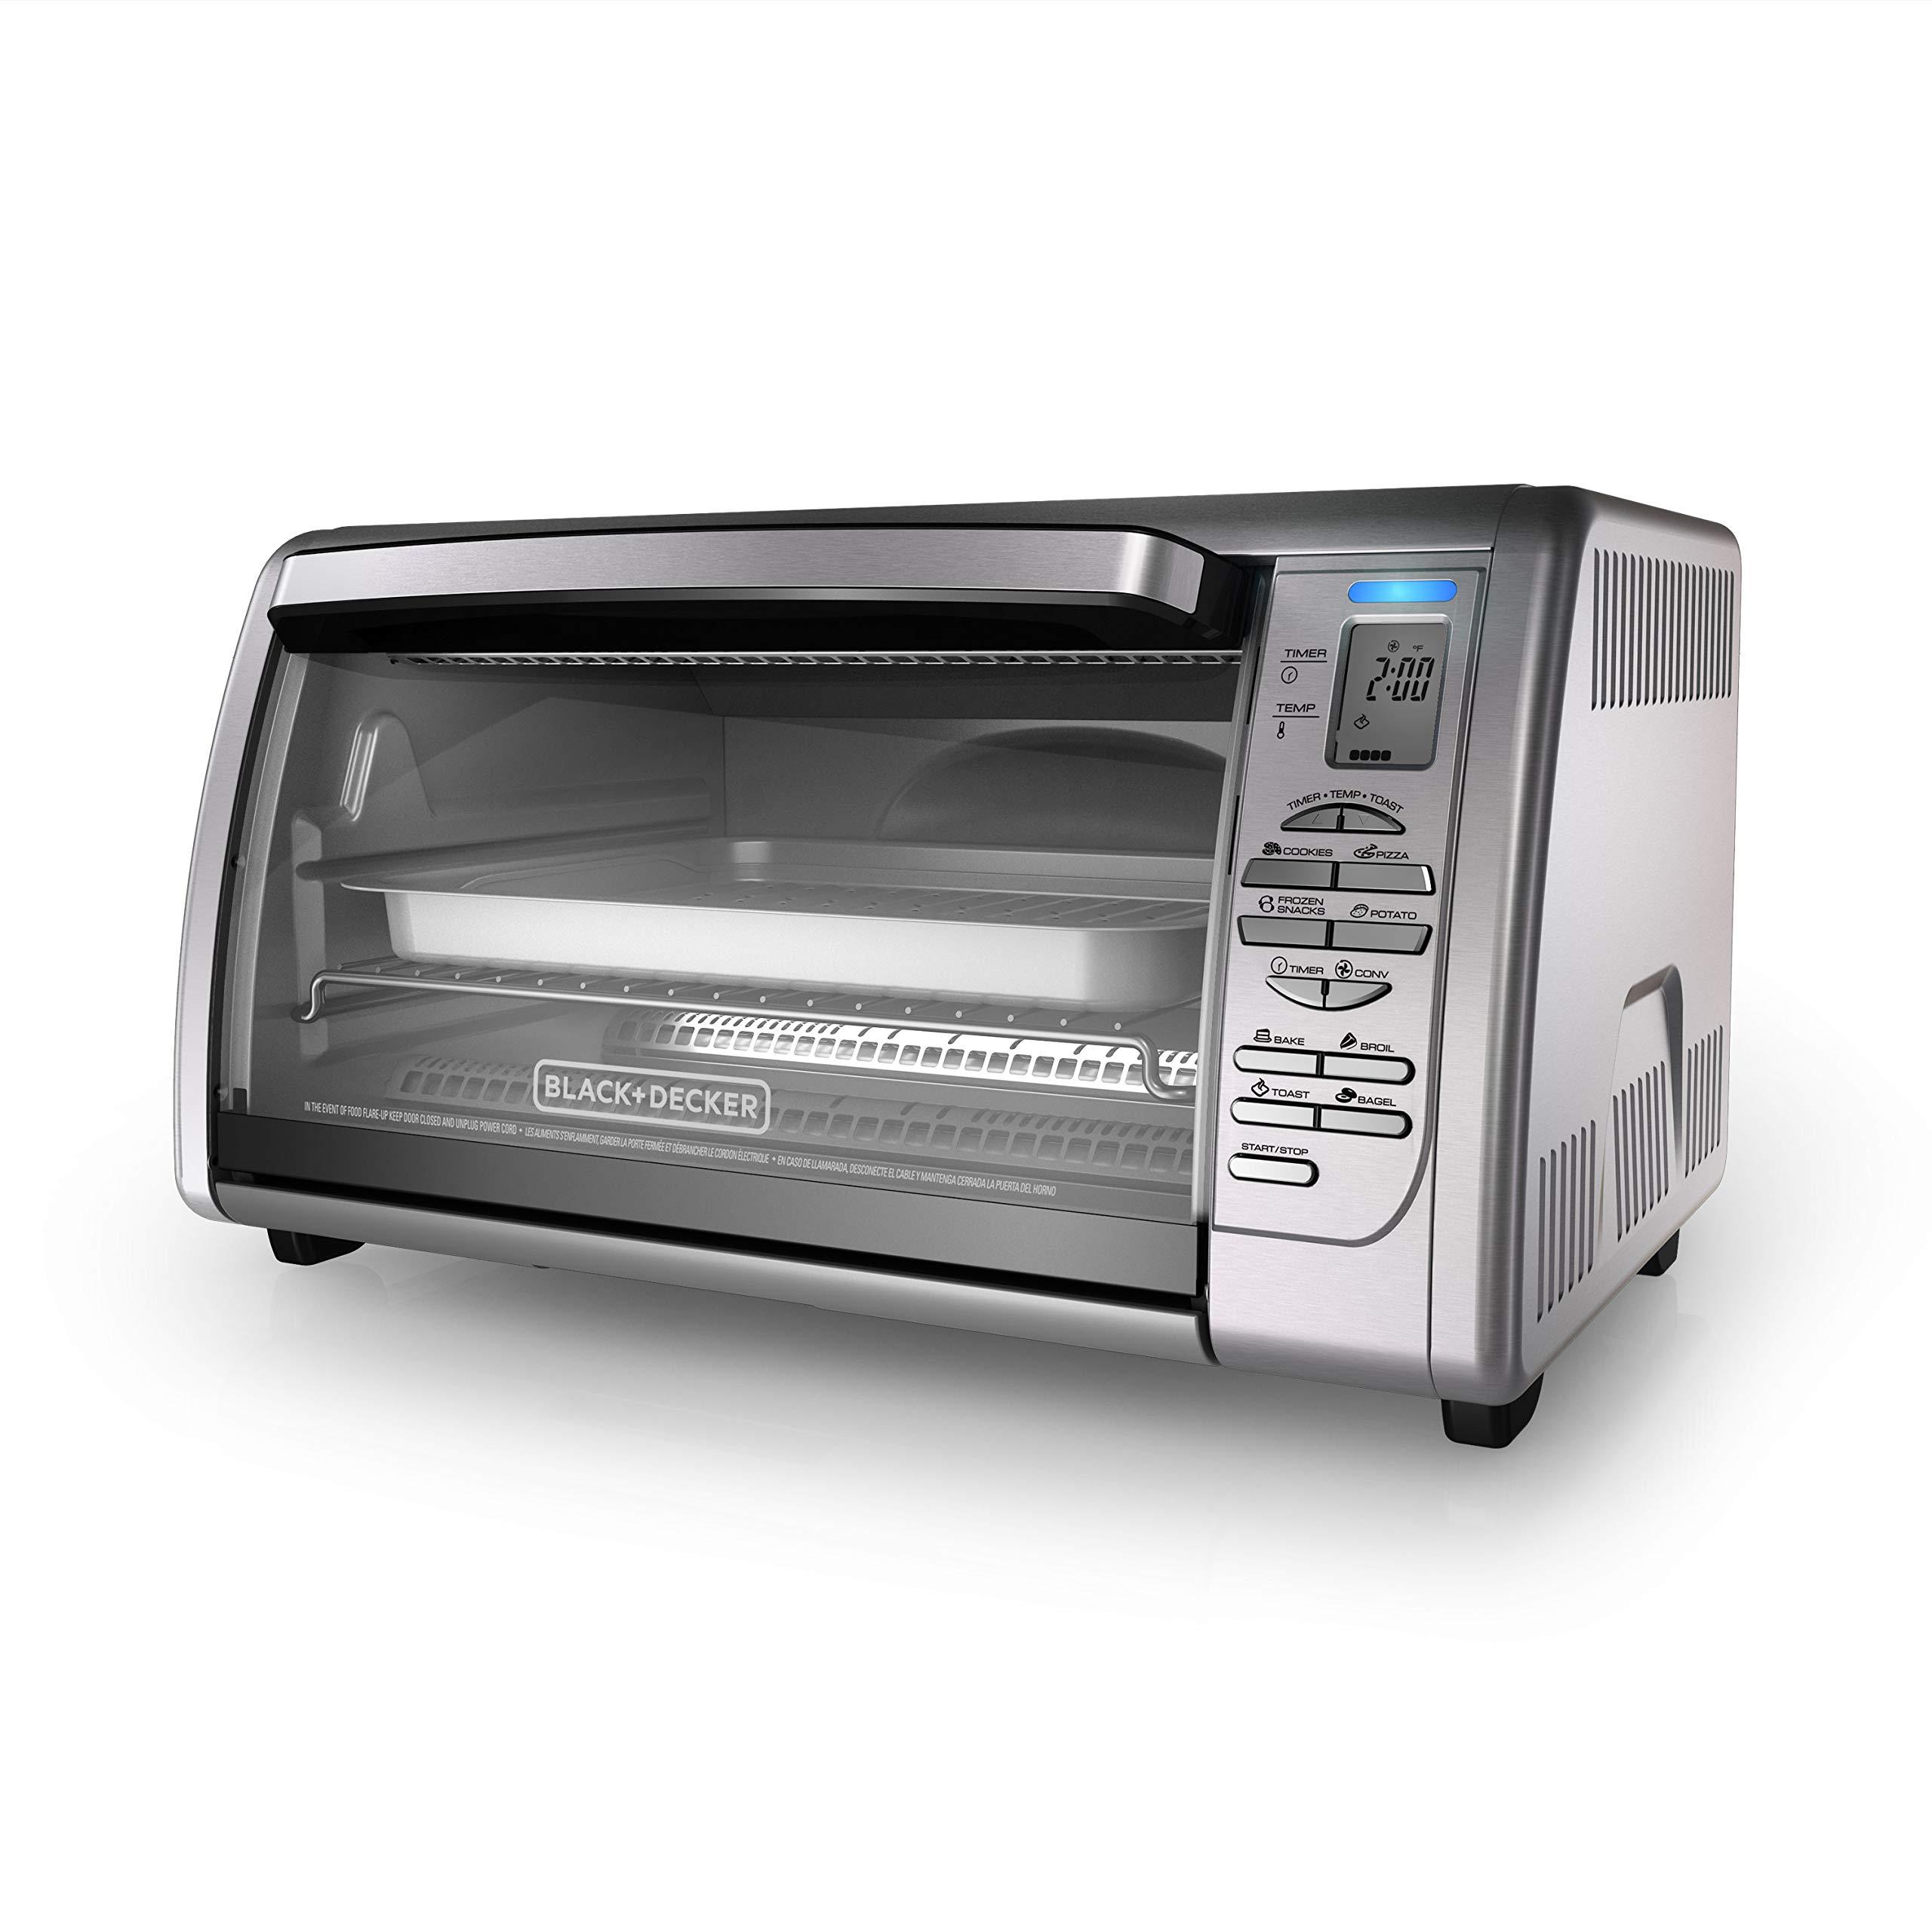 BLACK+DECKER Countertop Convection Toaster Oven, Silver, CTO6335S by BLACK+DECKER